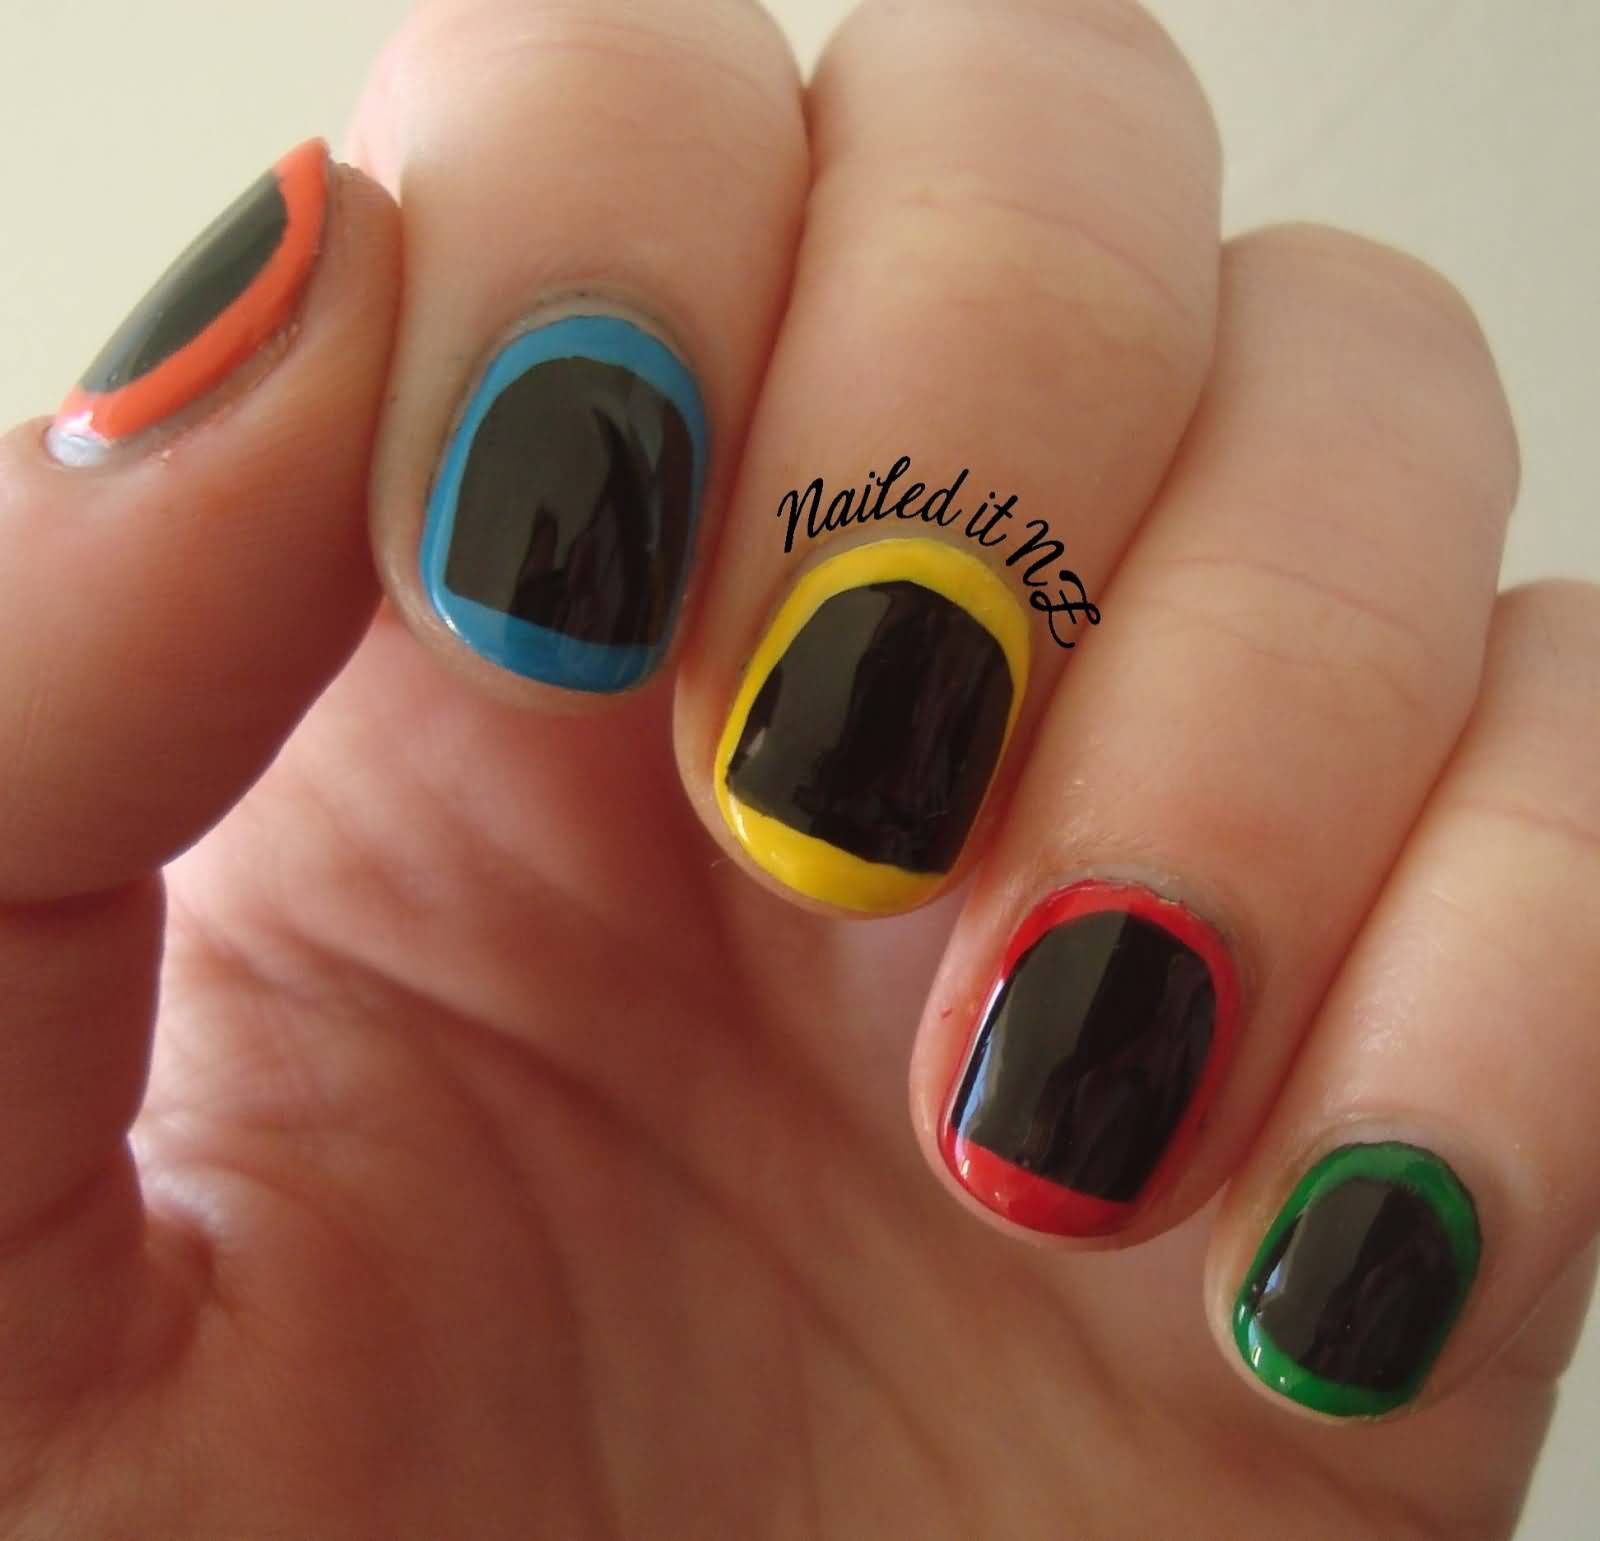 Ideas For Short Nails Easy Nail Art: 40 Elegant Short Nail Art Design Ideas